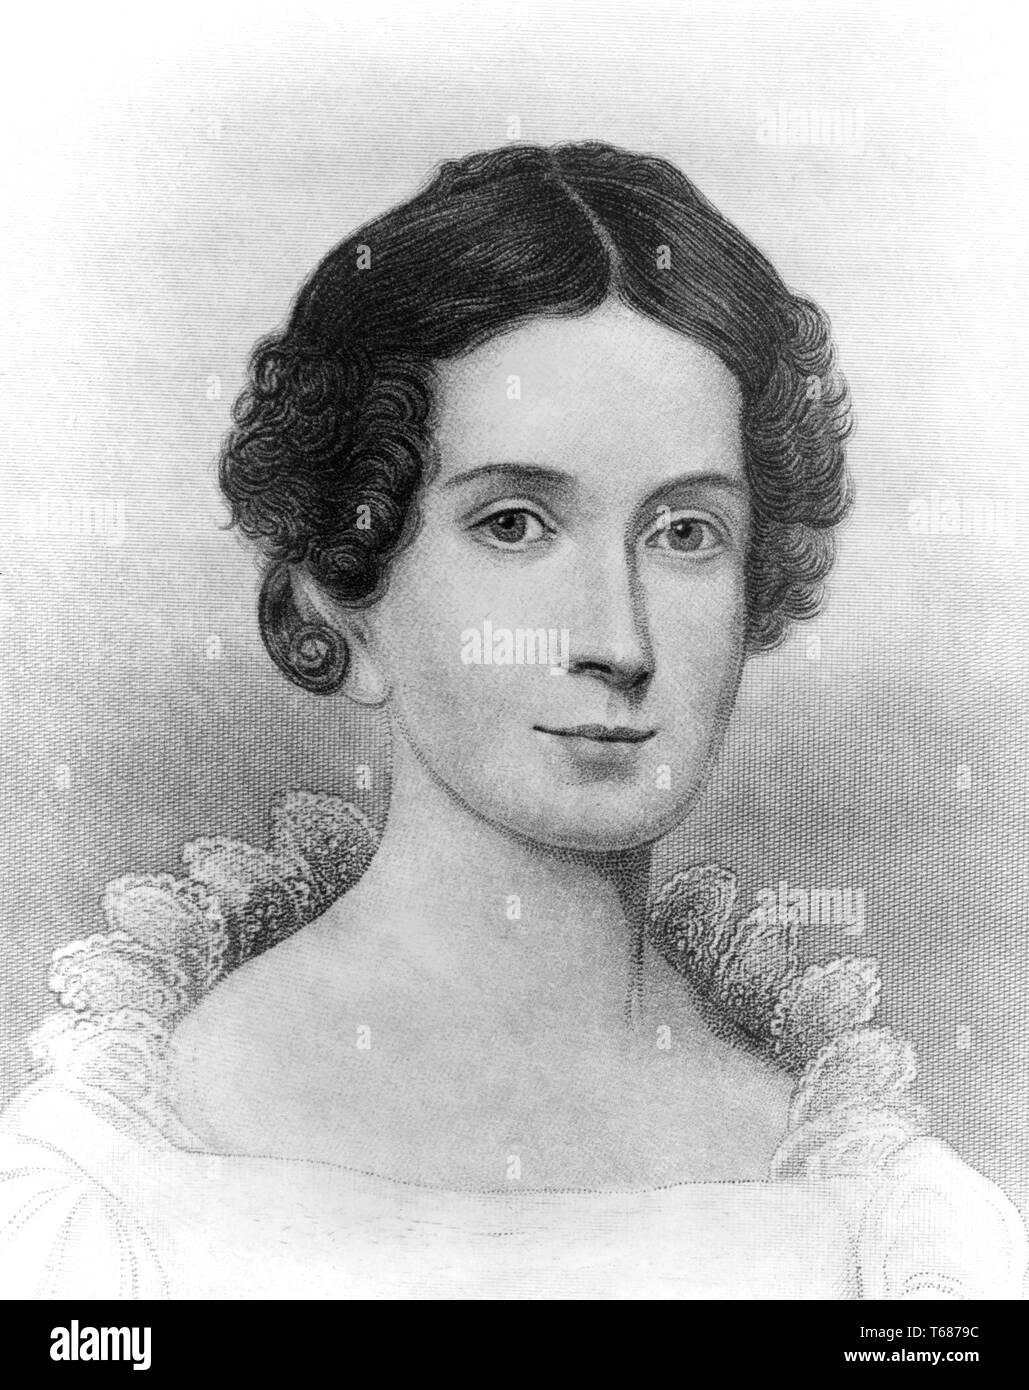 Letitia Christian Tyler, Wife of U.S. President John Tyler, Head and Shoulders Portrait, 1830's - Stock Image